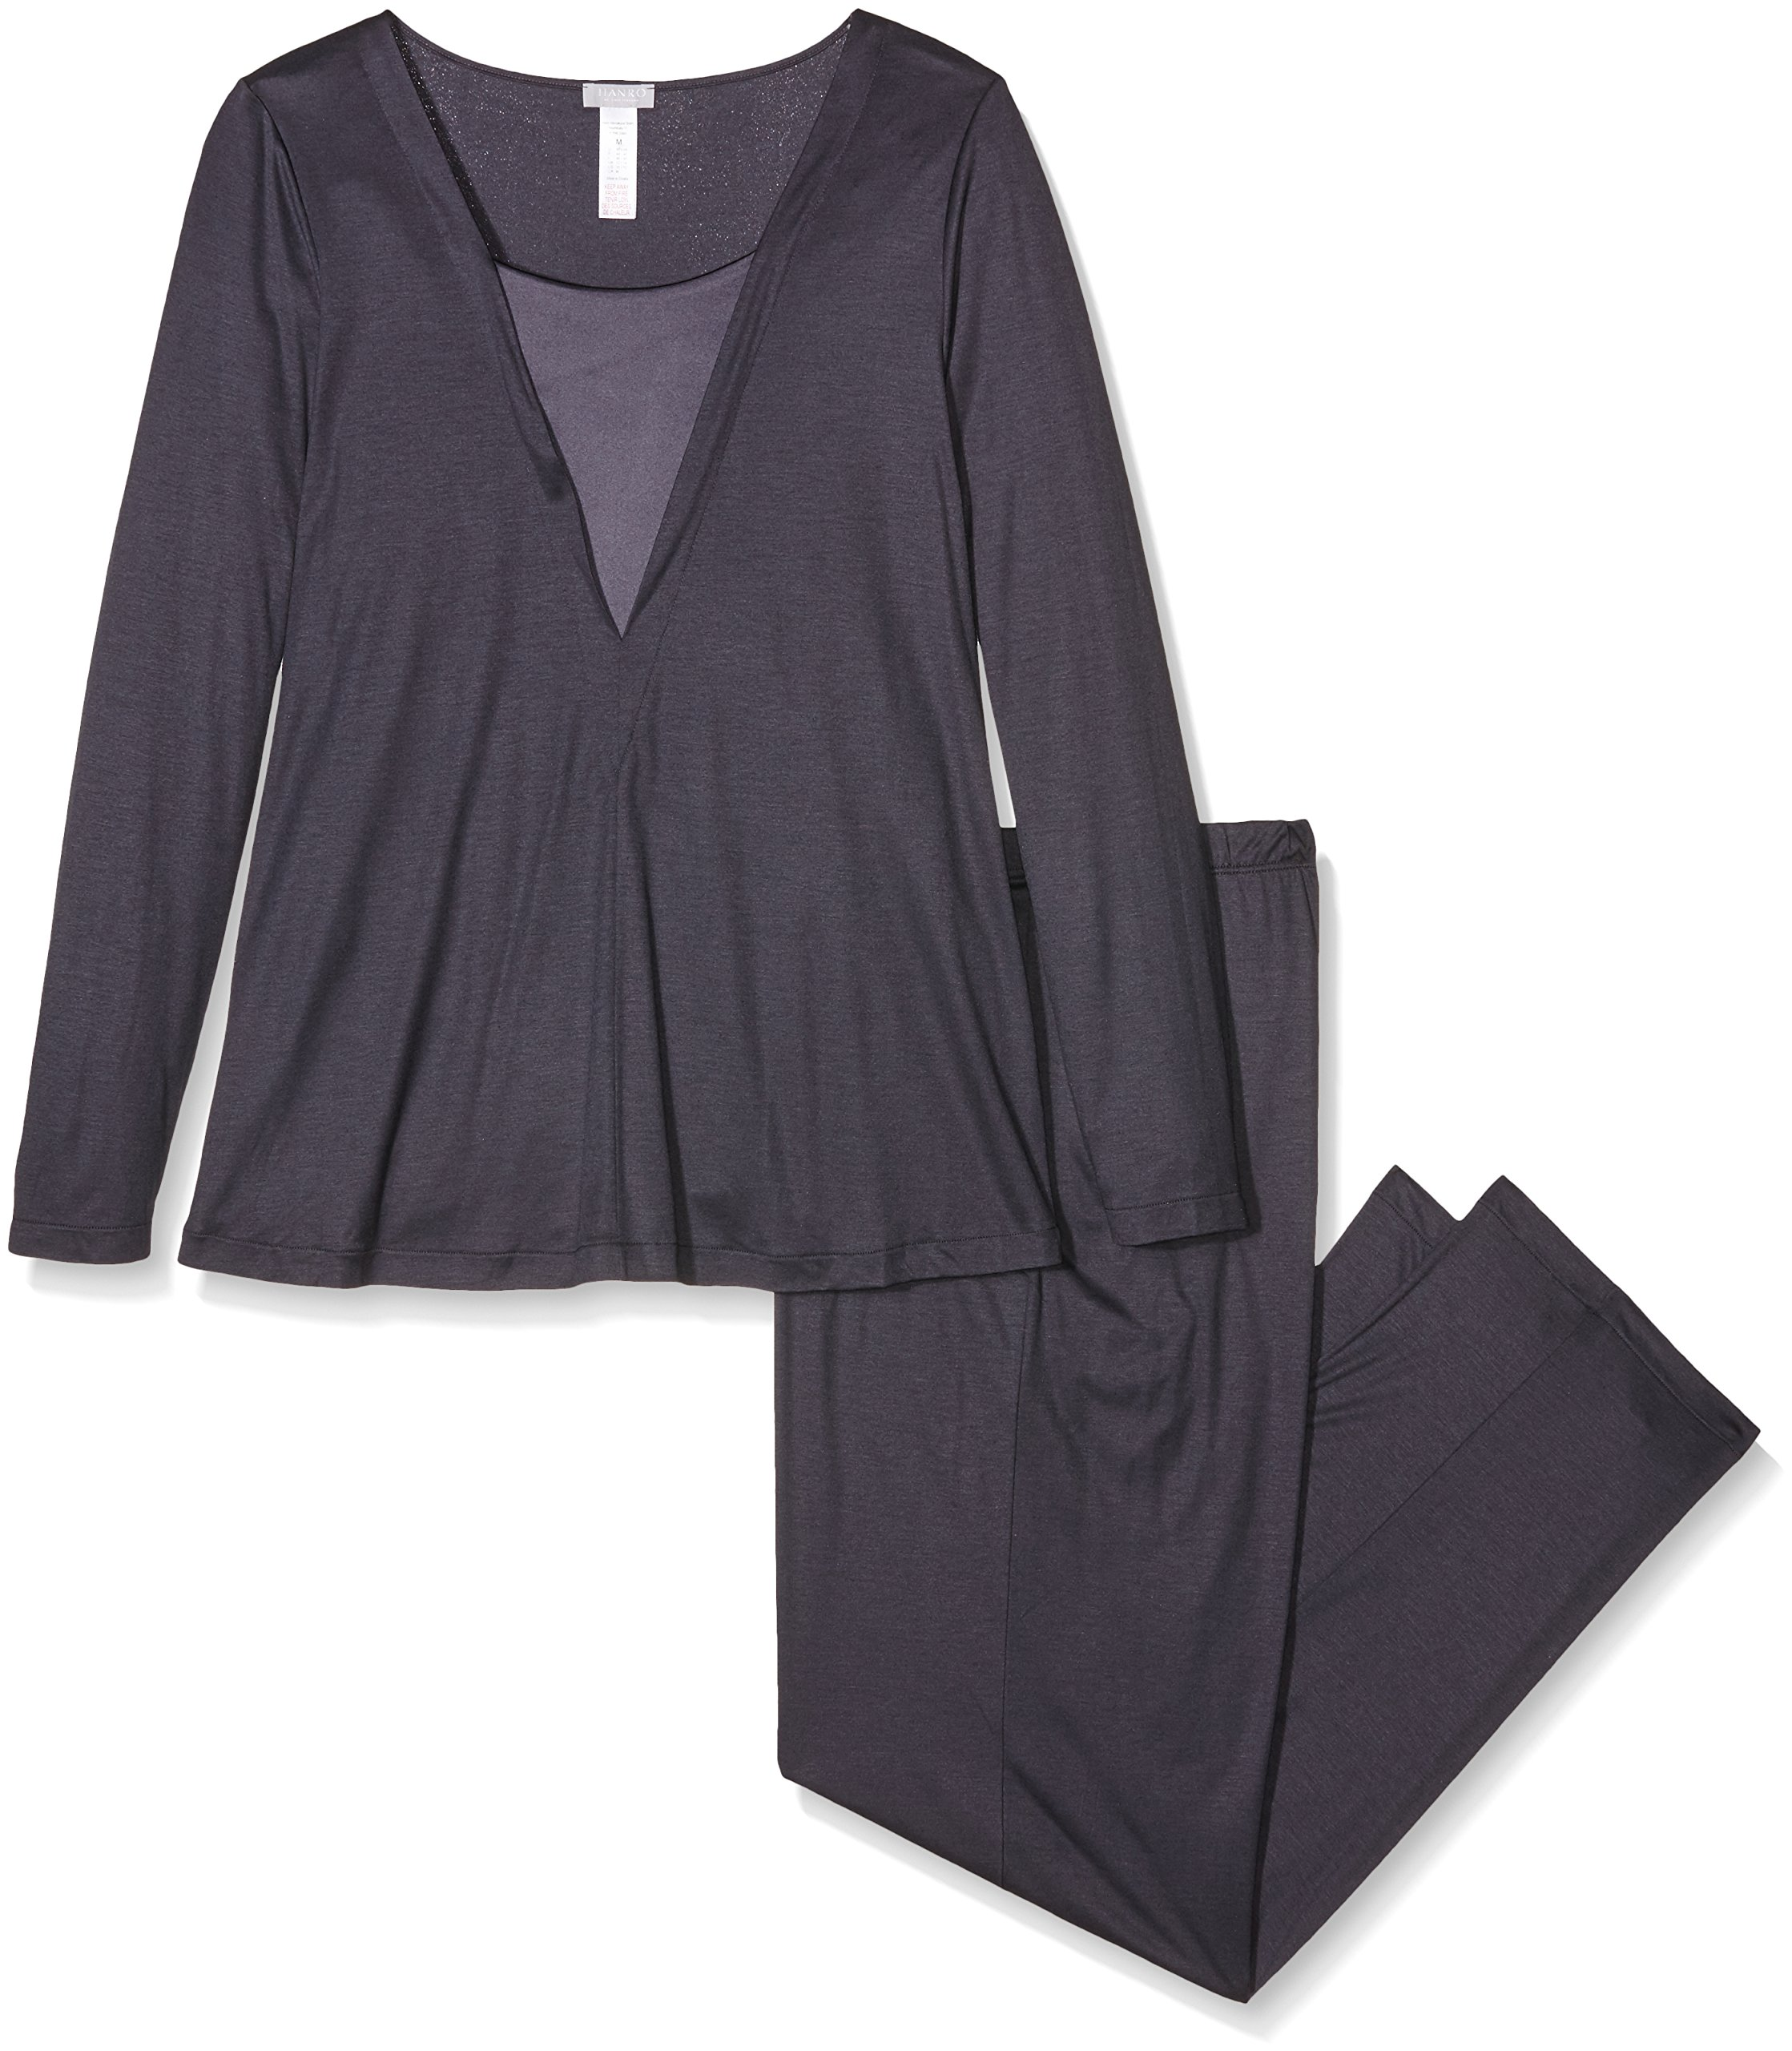 Hanro Women's Viola Long Sleeve Pajama Set, Purple Grey, X-Small